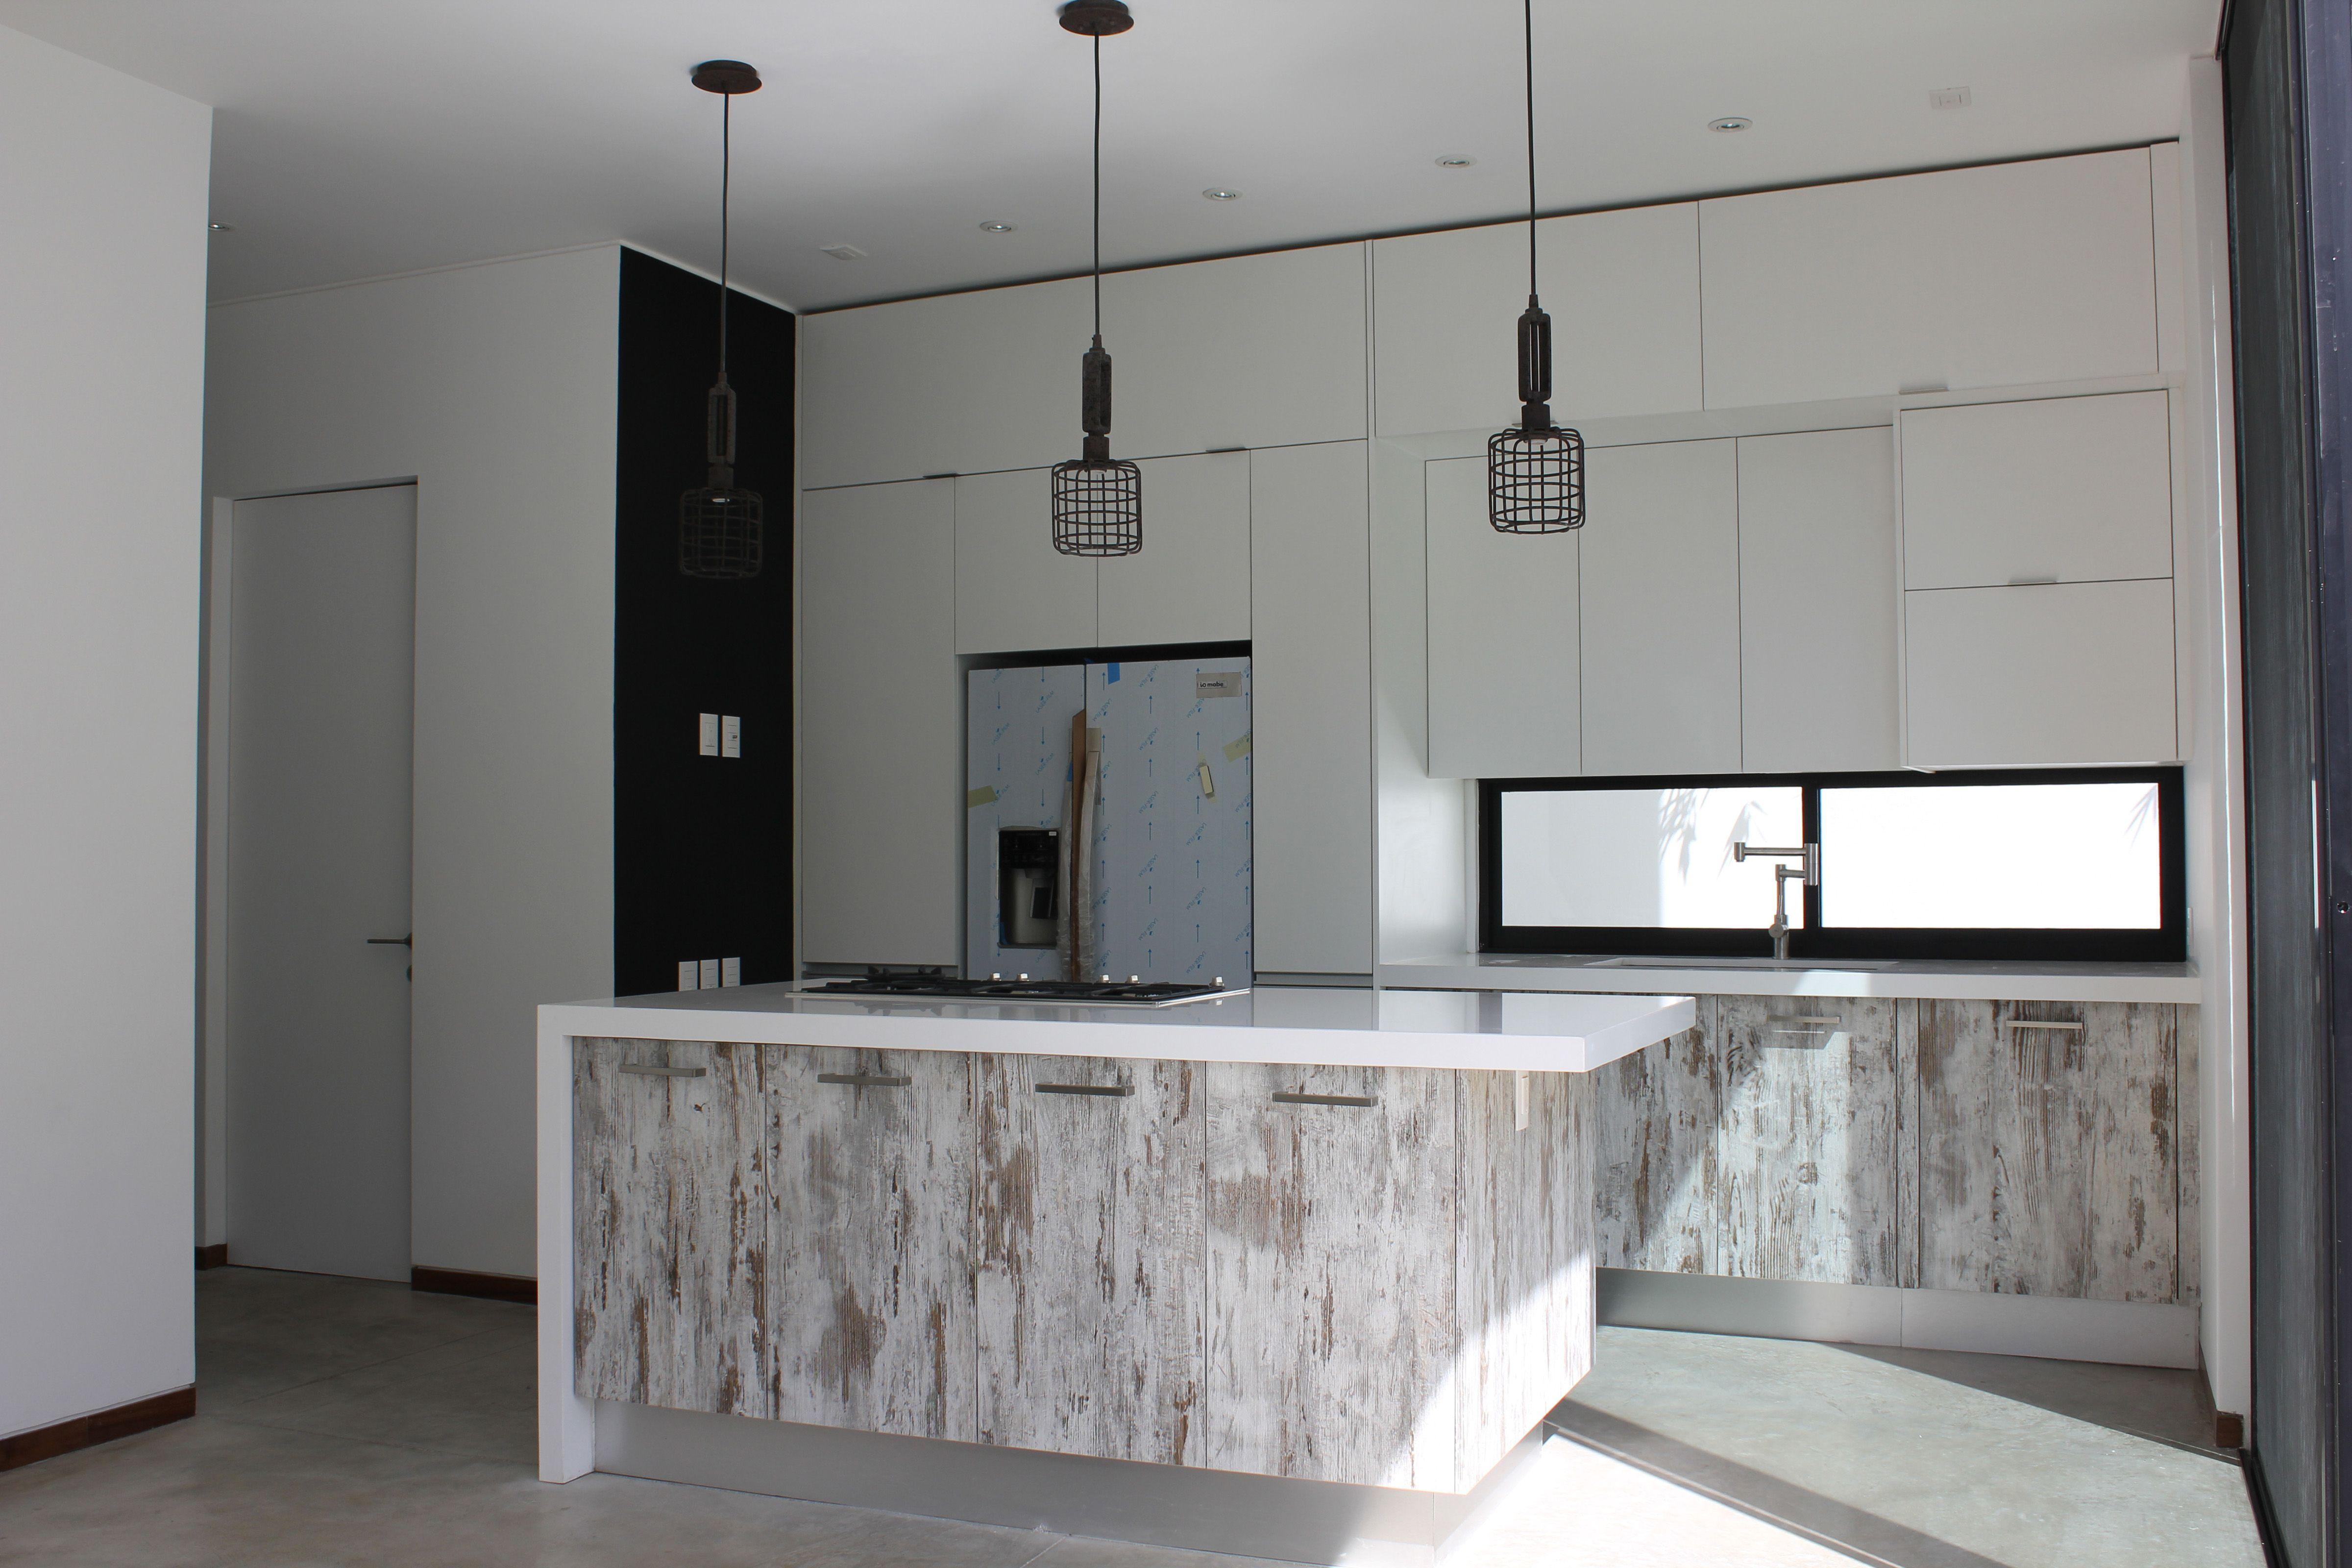 Casa en valle real cocina con madera avejentada y barra for Barras de cocina de concreto